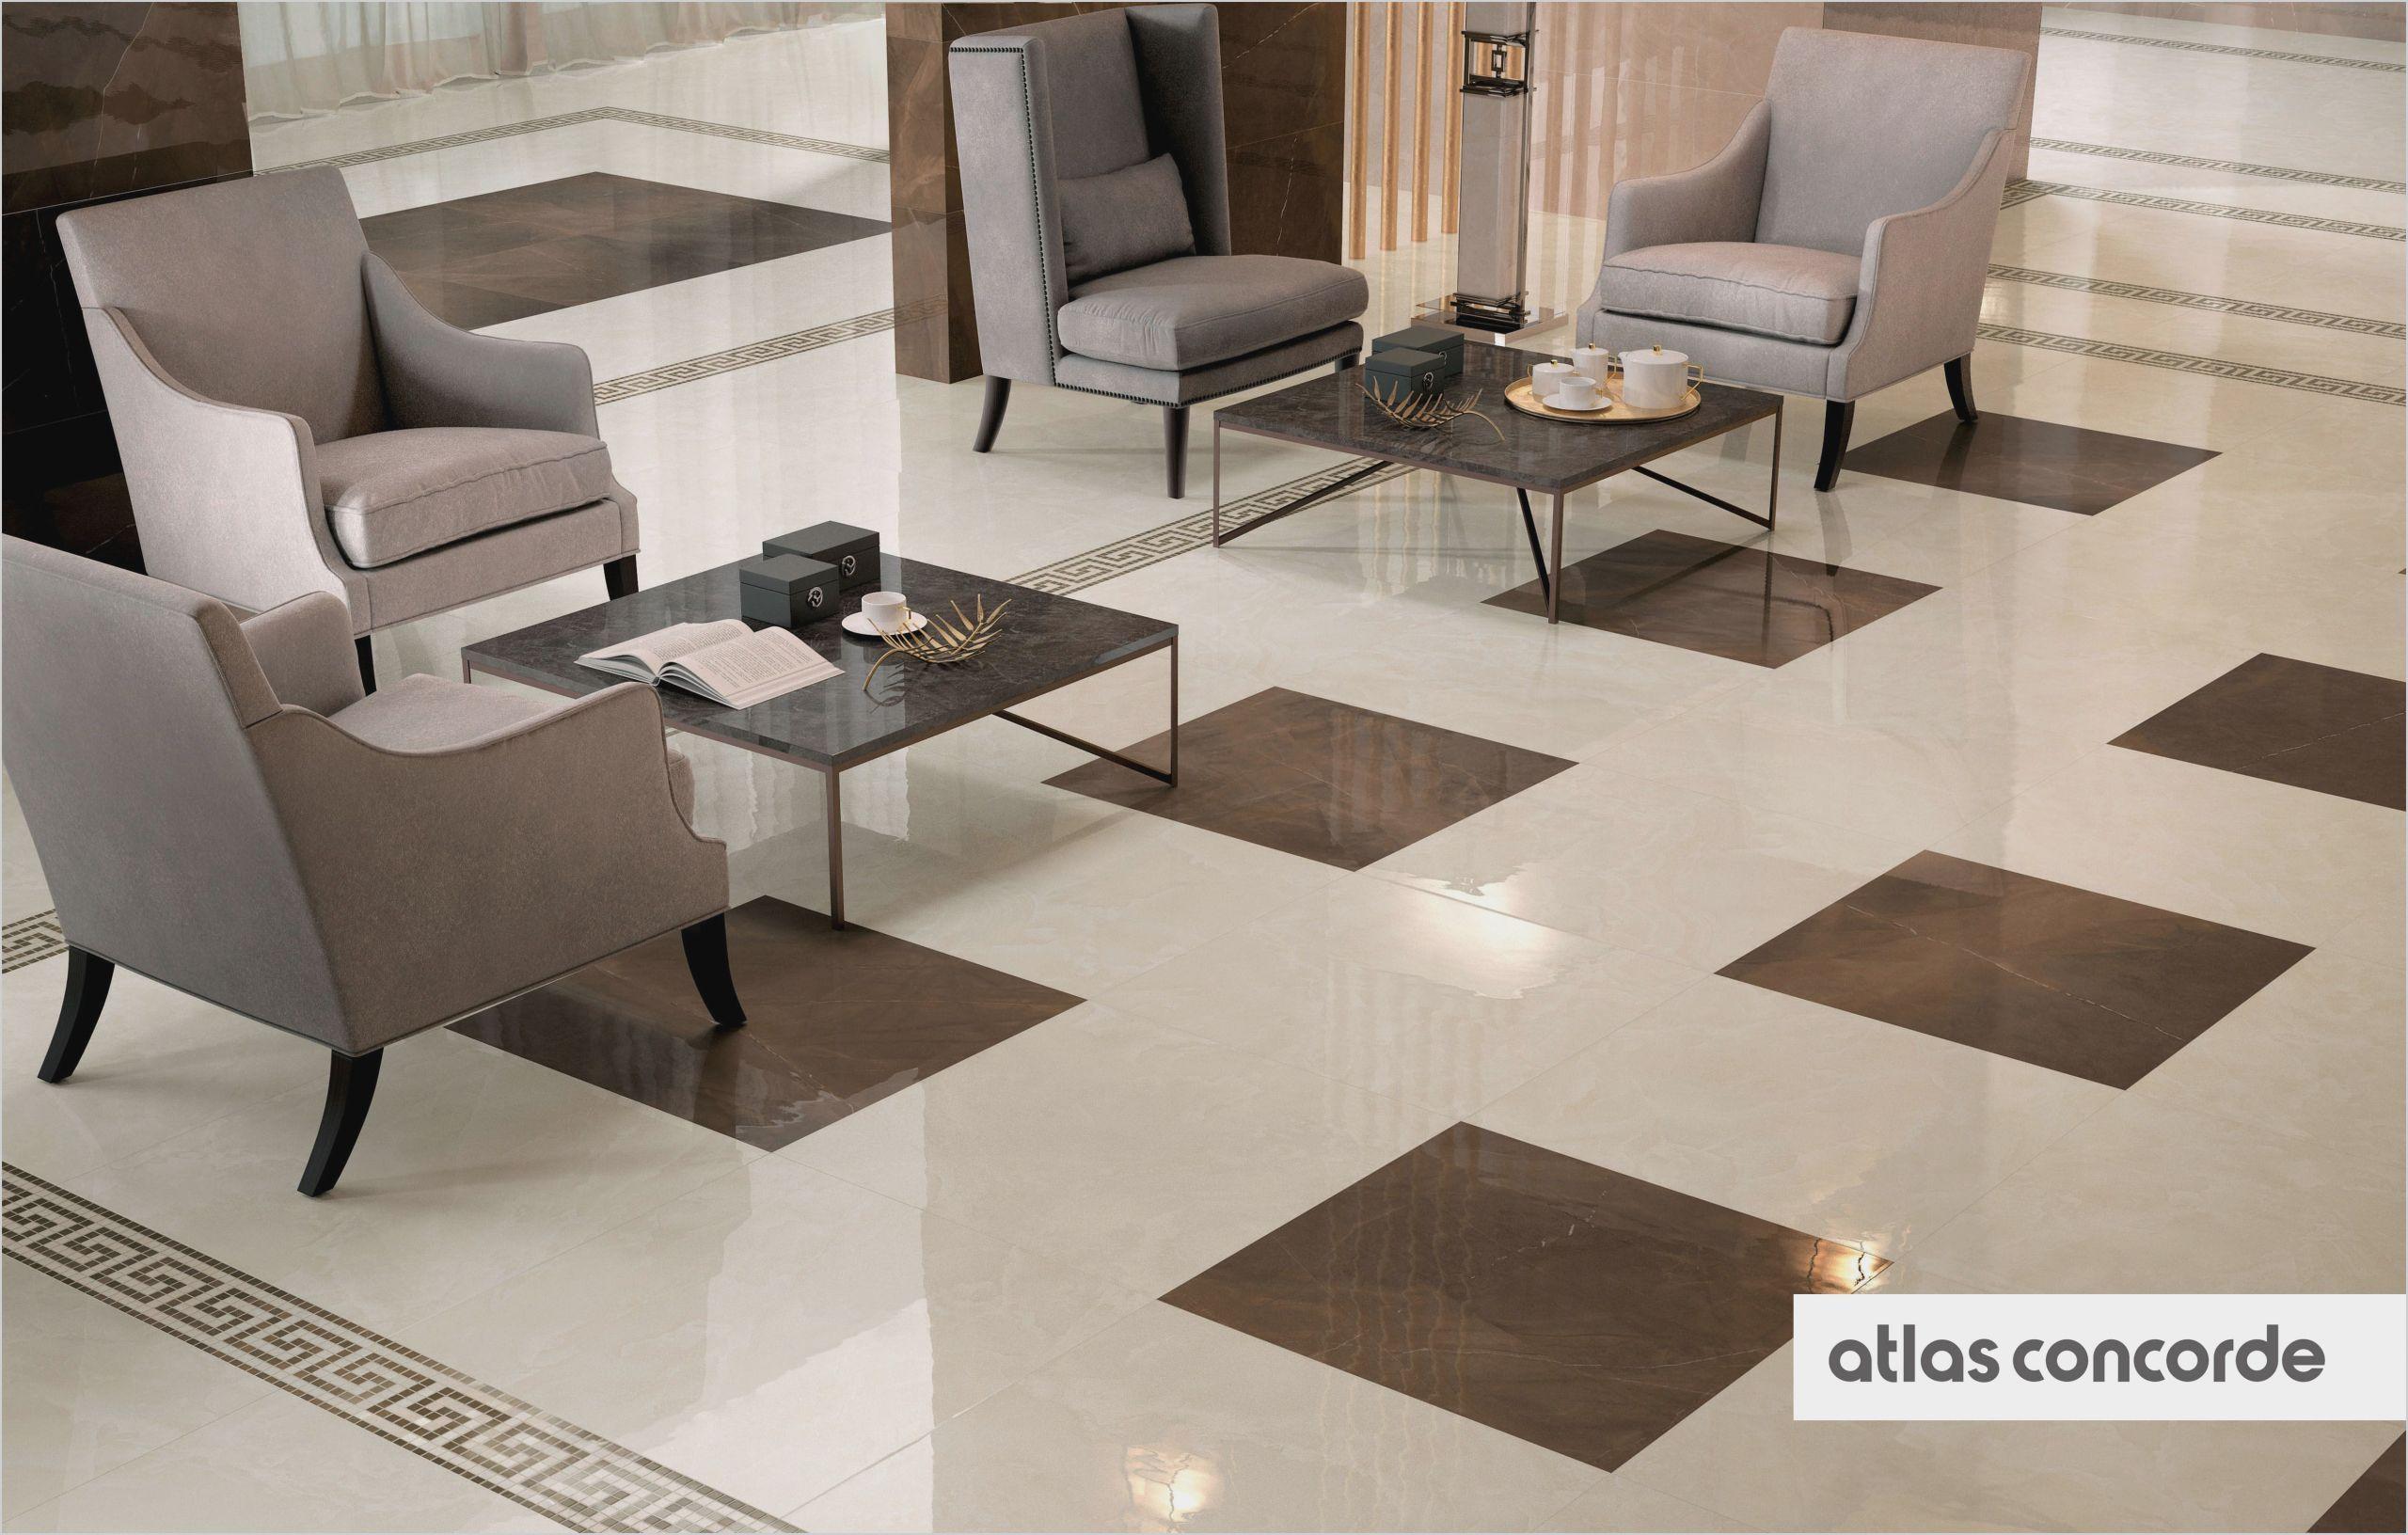 Marble Flooring Designs For Living Room India Living Room Tiles Design Living Room Tiles Marble Flooring Design